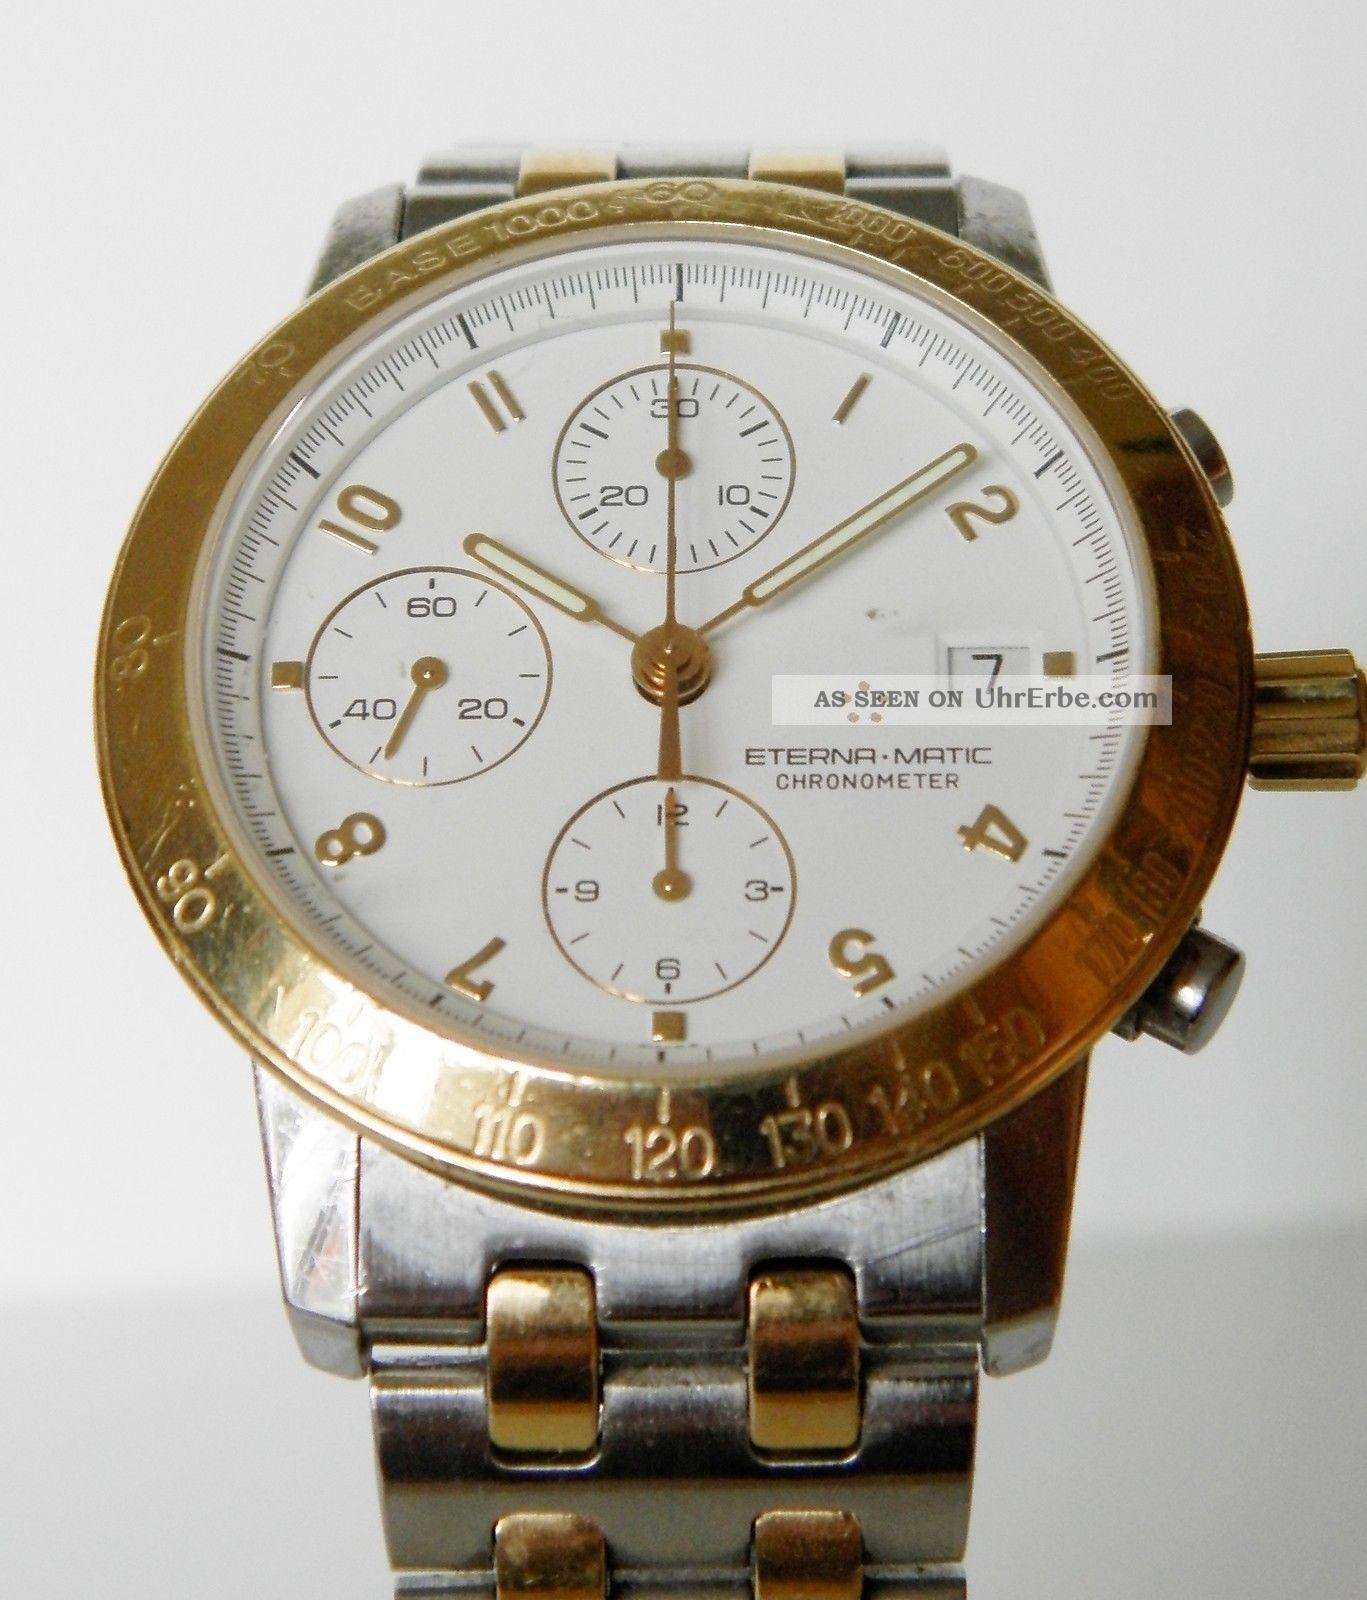 Eterna - Matic,  Kontiki Chronometer Chronograph,  Mit Box Armbanduhren Bild